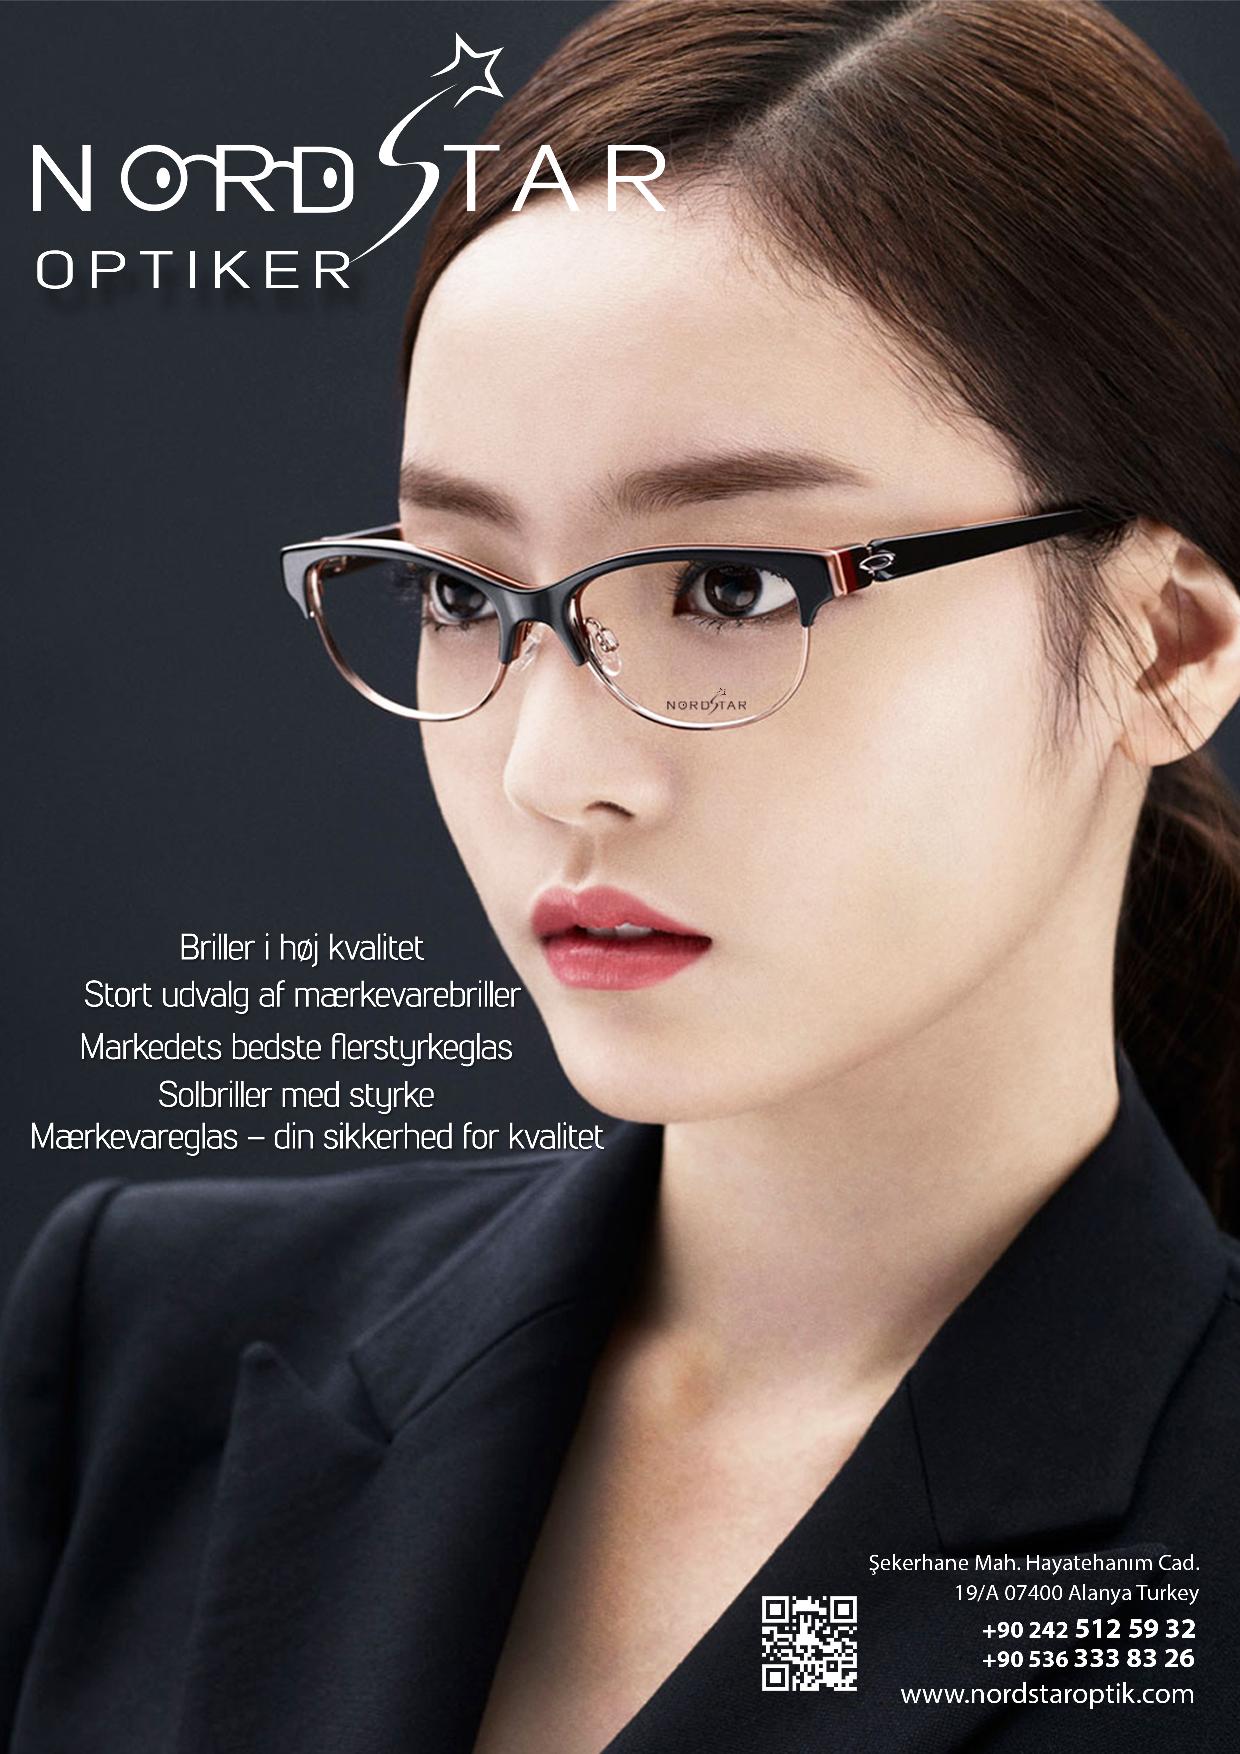 nordstar-optik-reklam-2.png